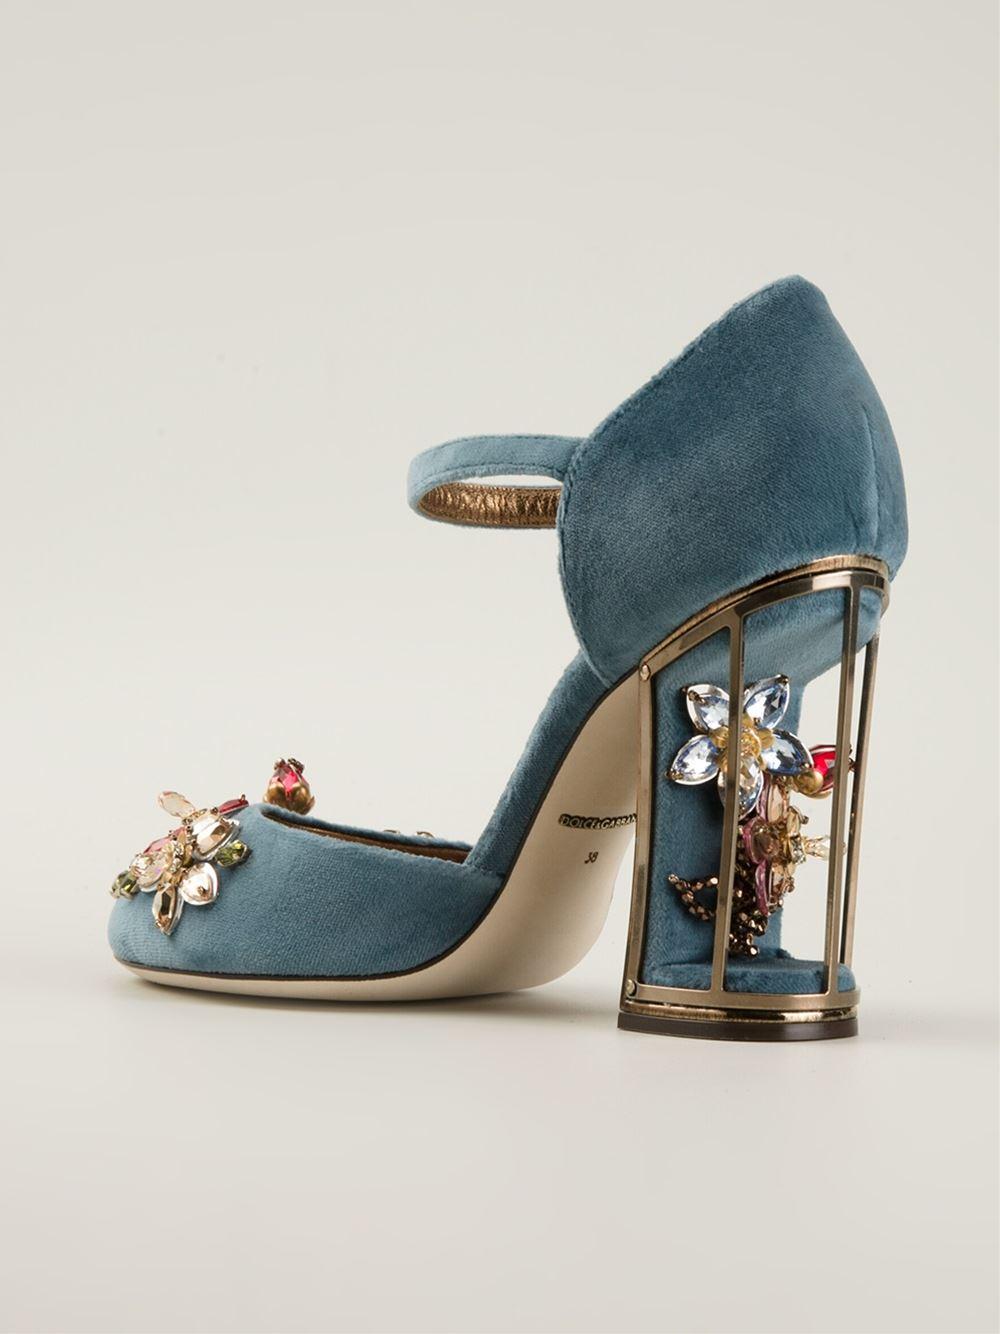 7a312c81d Dolce   Gabbana Gemstone Embellished Pumps in Blue - Lyst